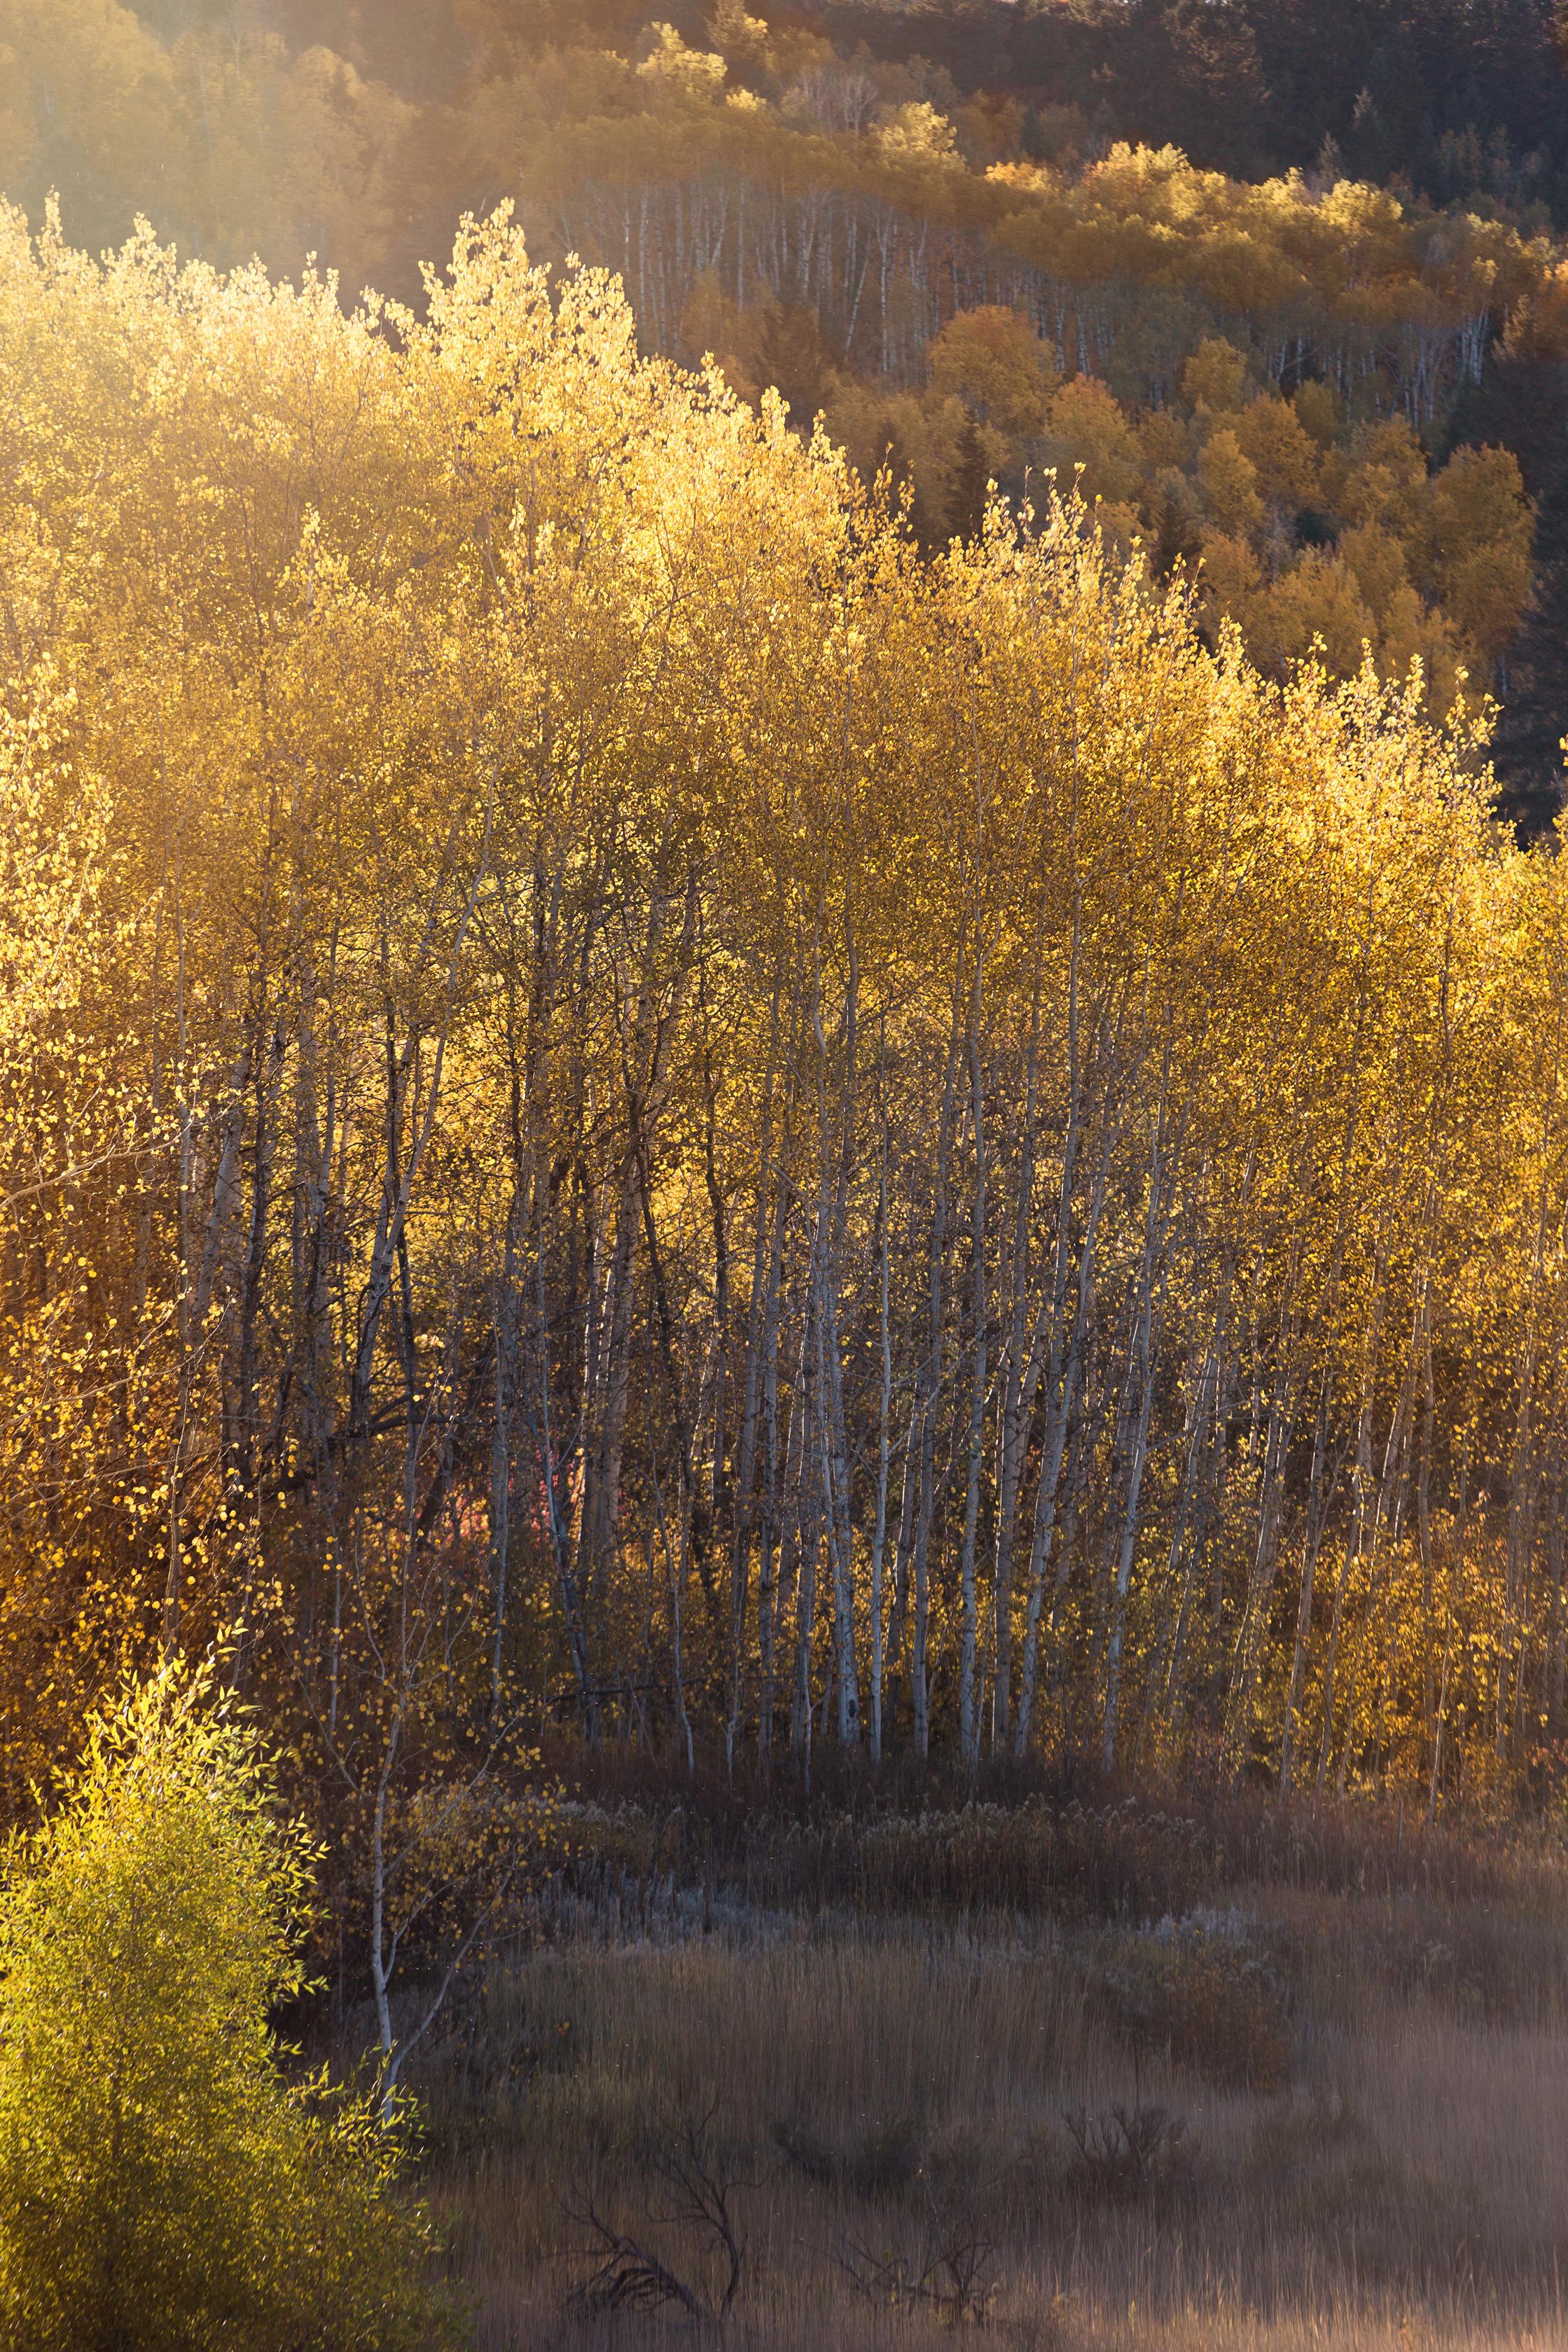 Cindy_Giovagnoli_Idaho_Wyoming_Grand_Teton_National_Park_autumn_aspens_camping_mountains-010.jpg